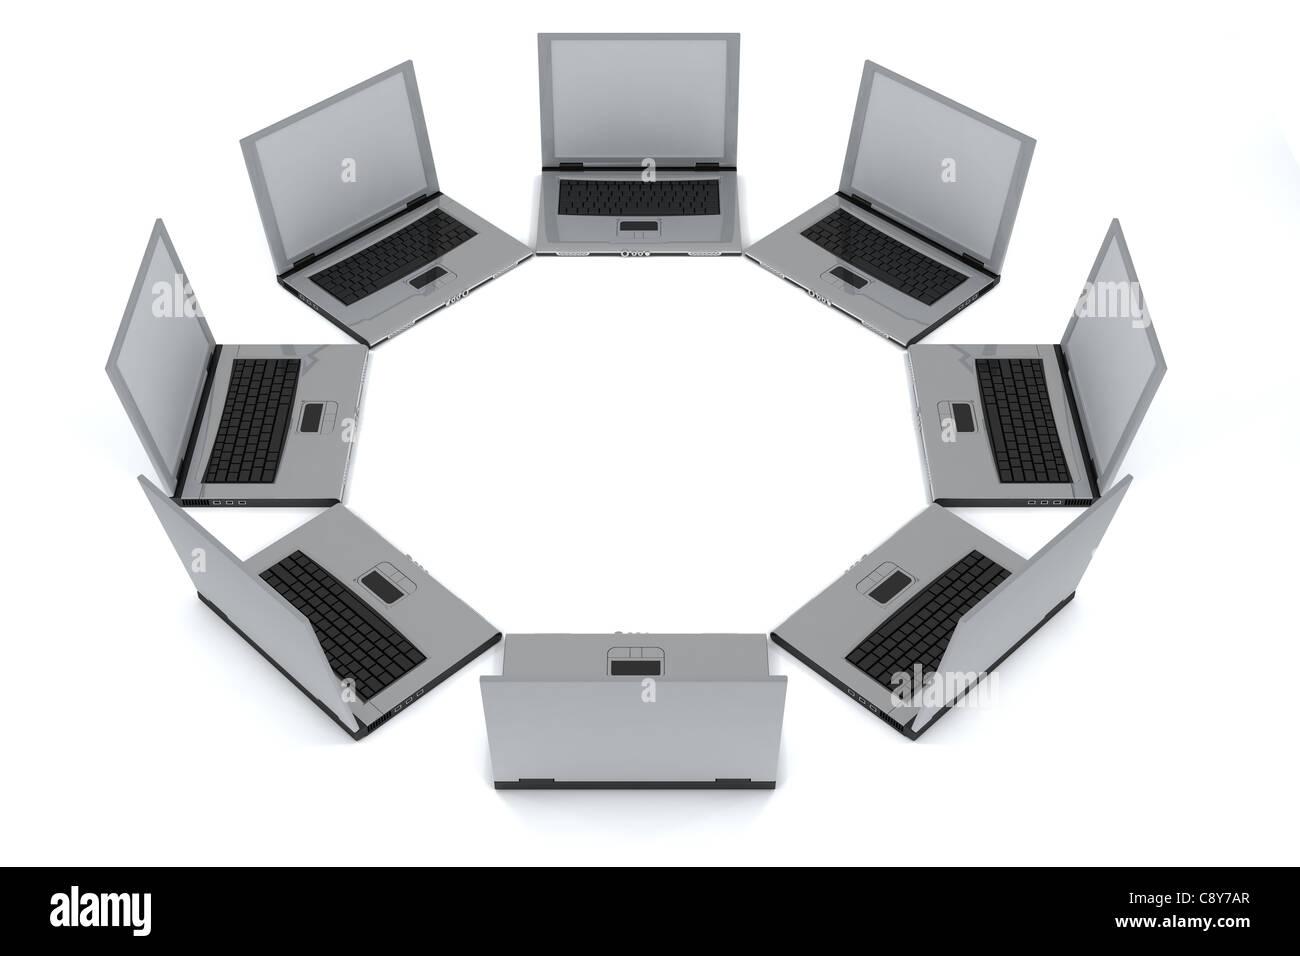 Laptops - Stock Image